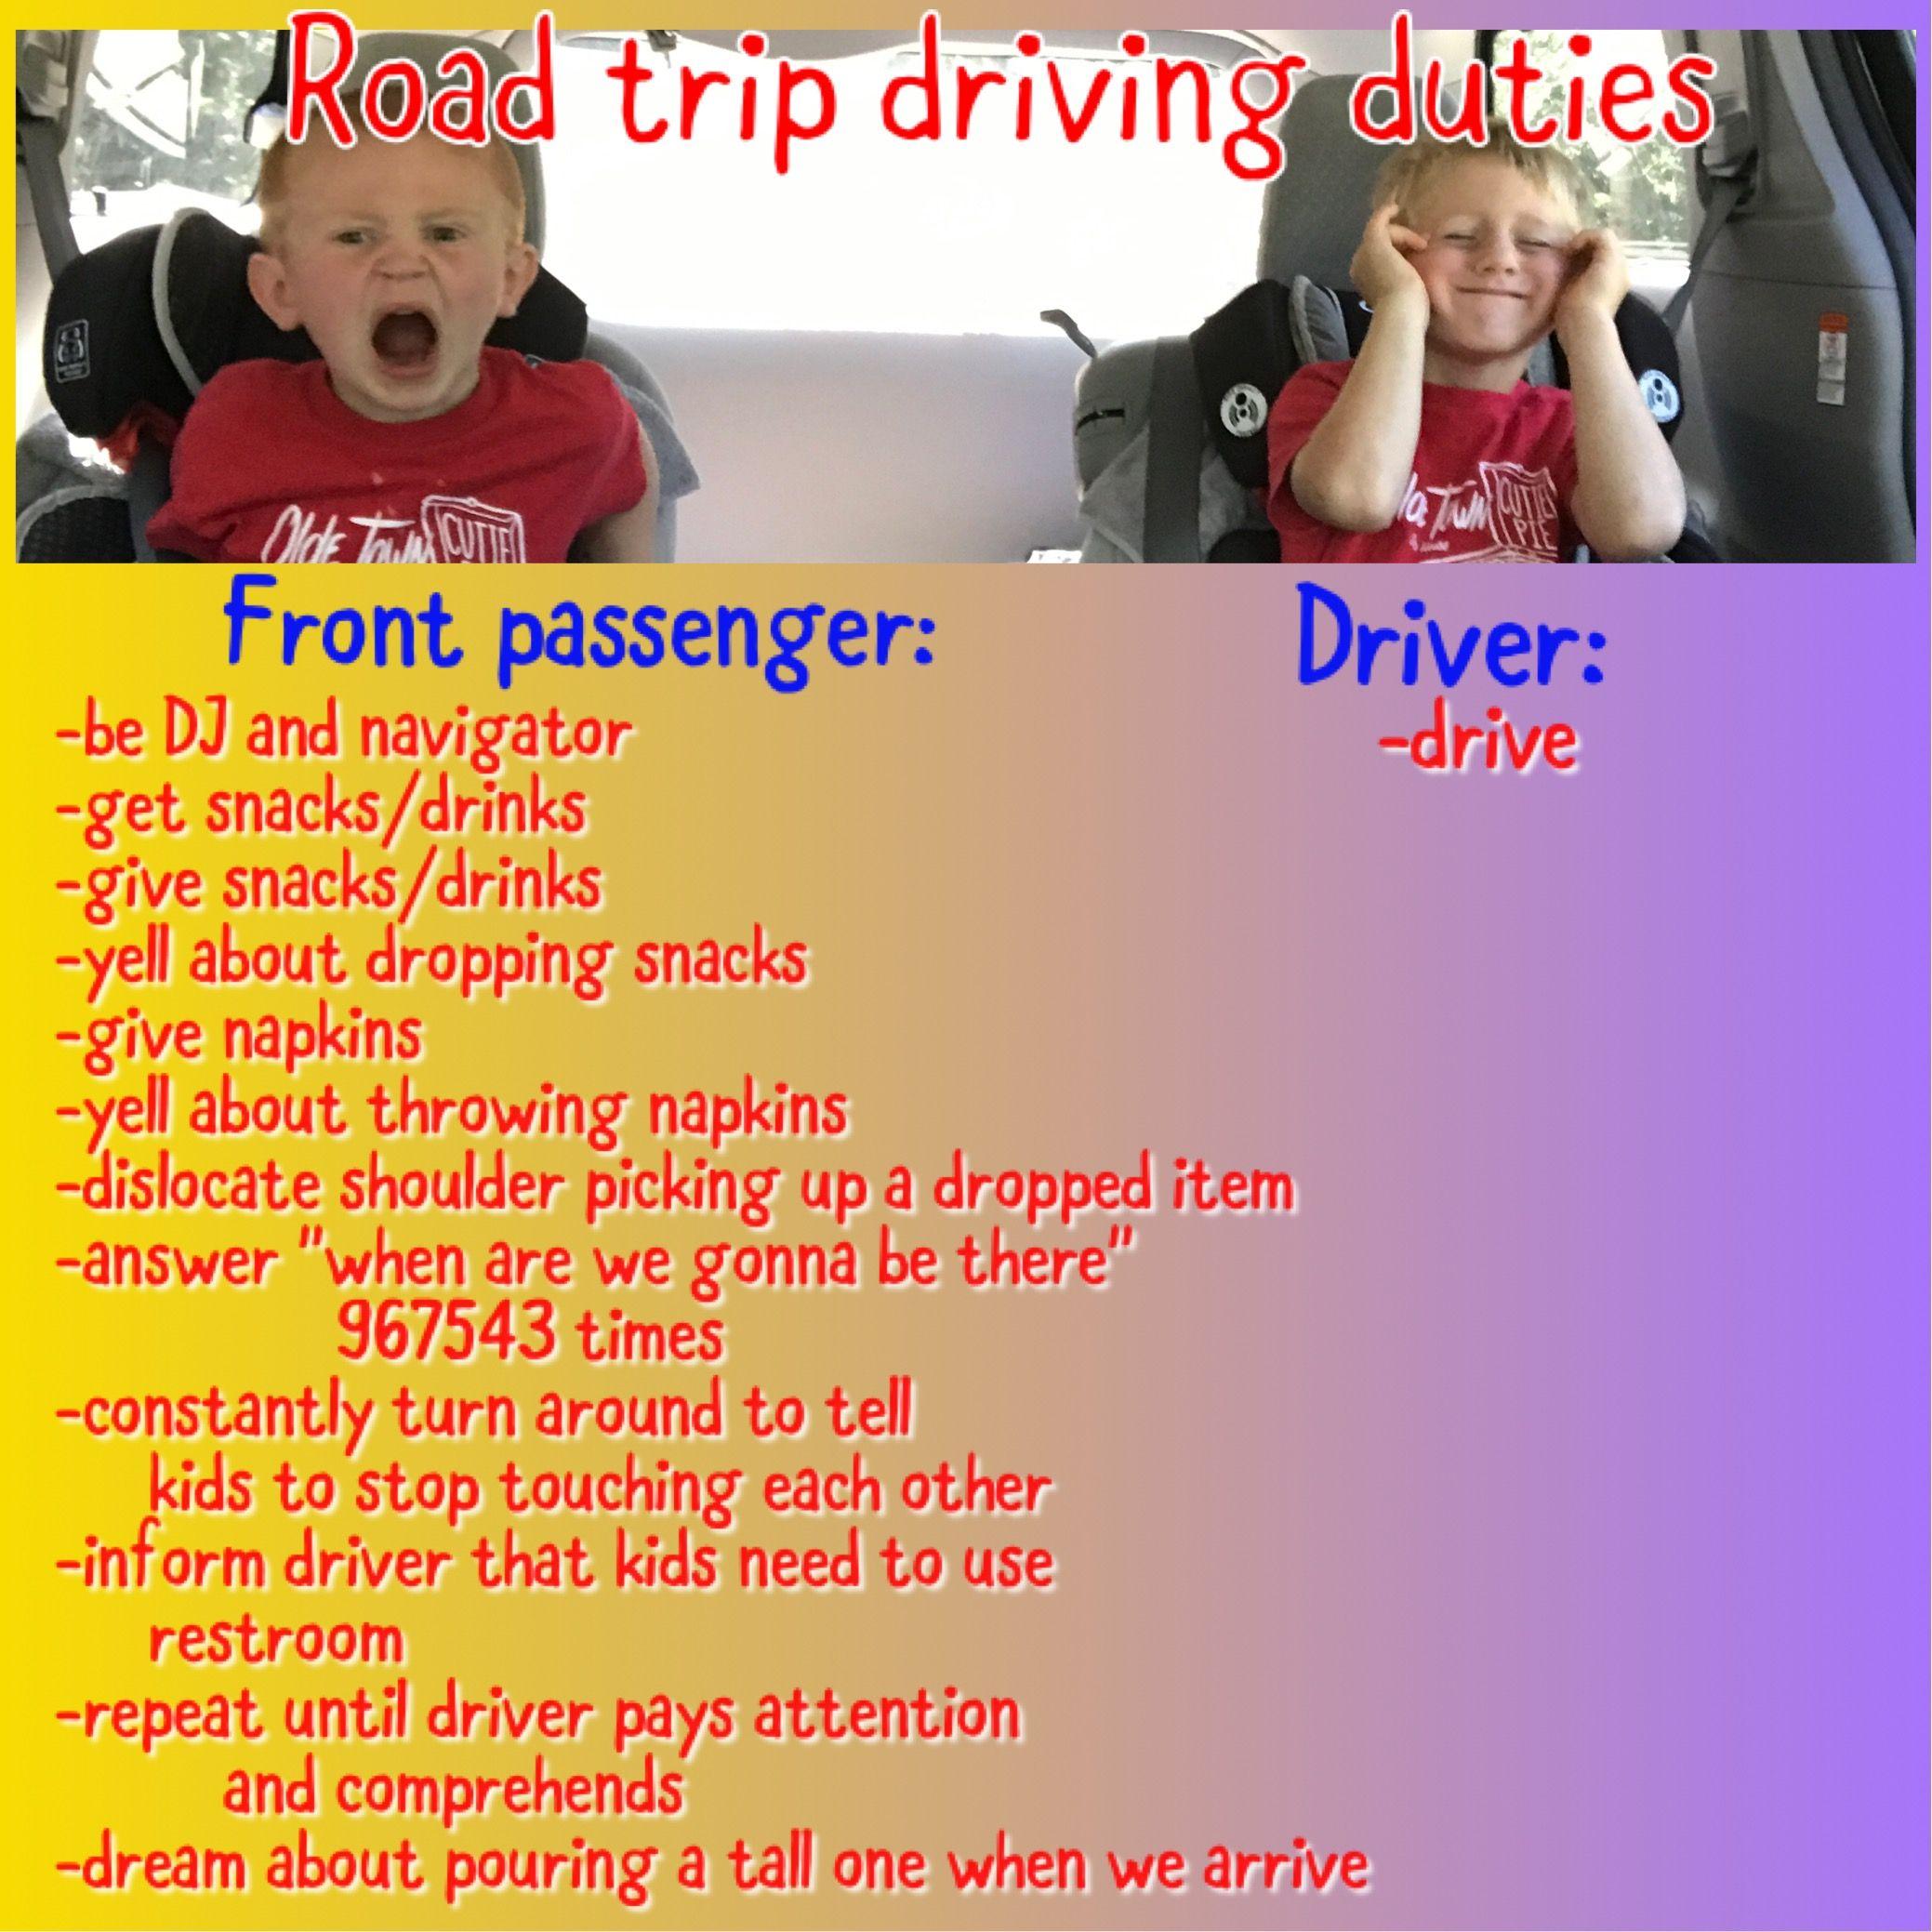 Road Trip Driving Duties